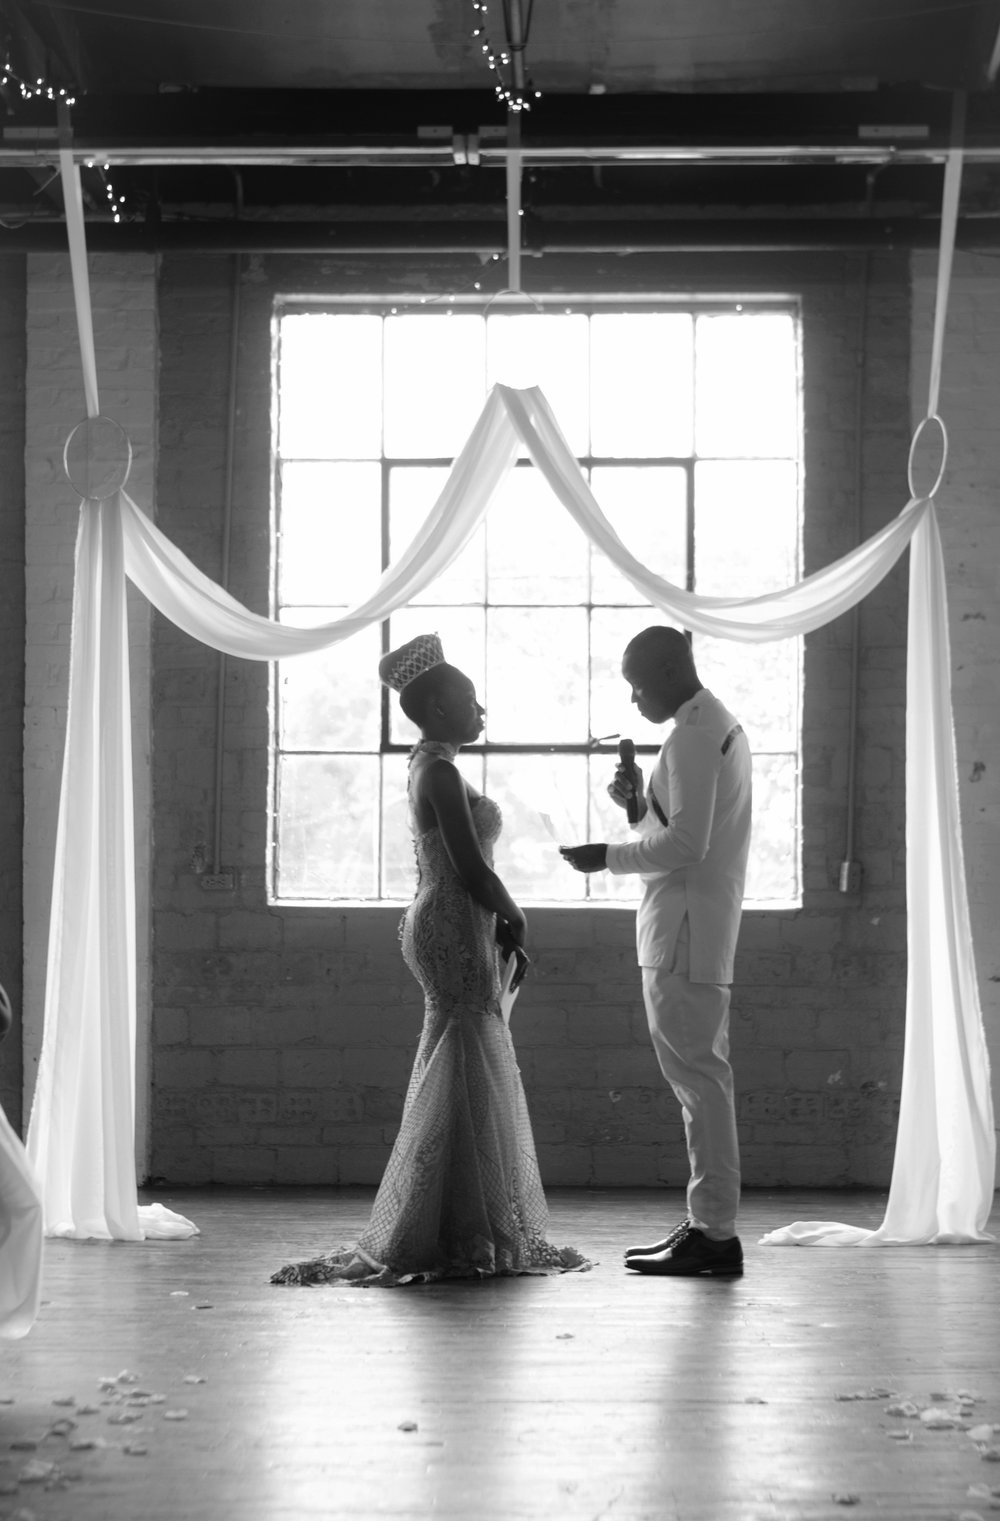 summer_wedding_commerce_atlanta_athens_threaded_culture_photography-3.jpg